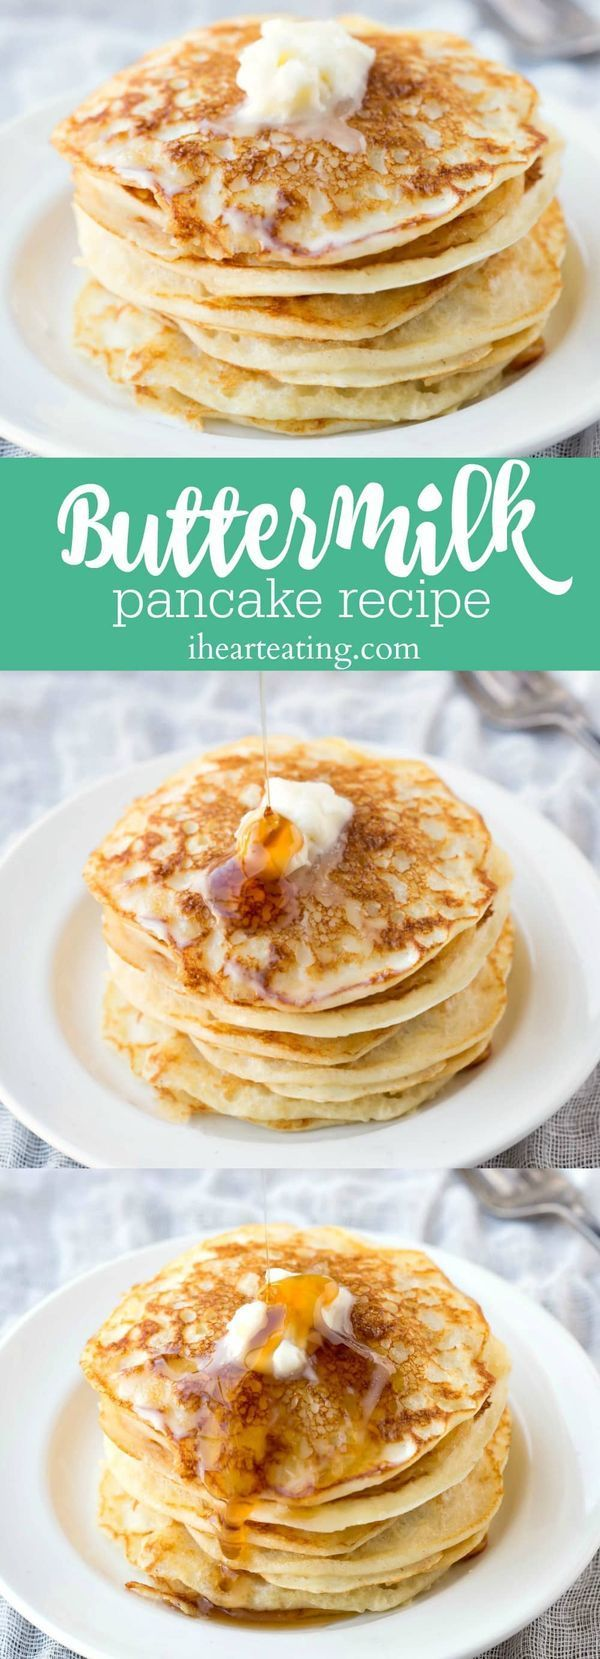 Buttermilk Pancake Recipe - classic light and fluffy breakfast recipe.